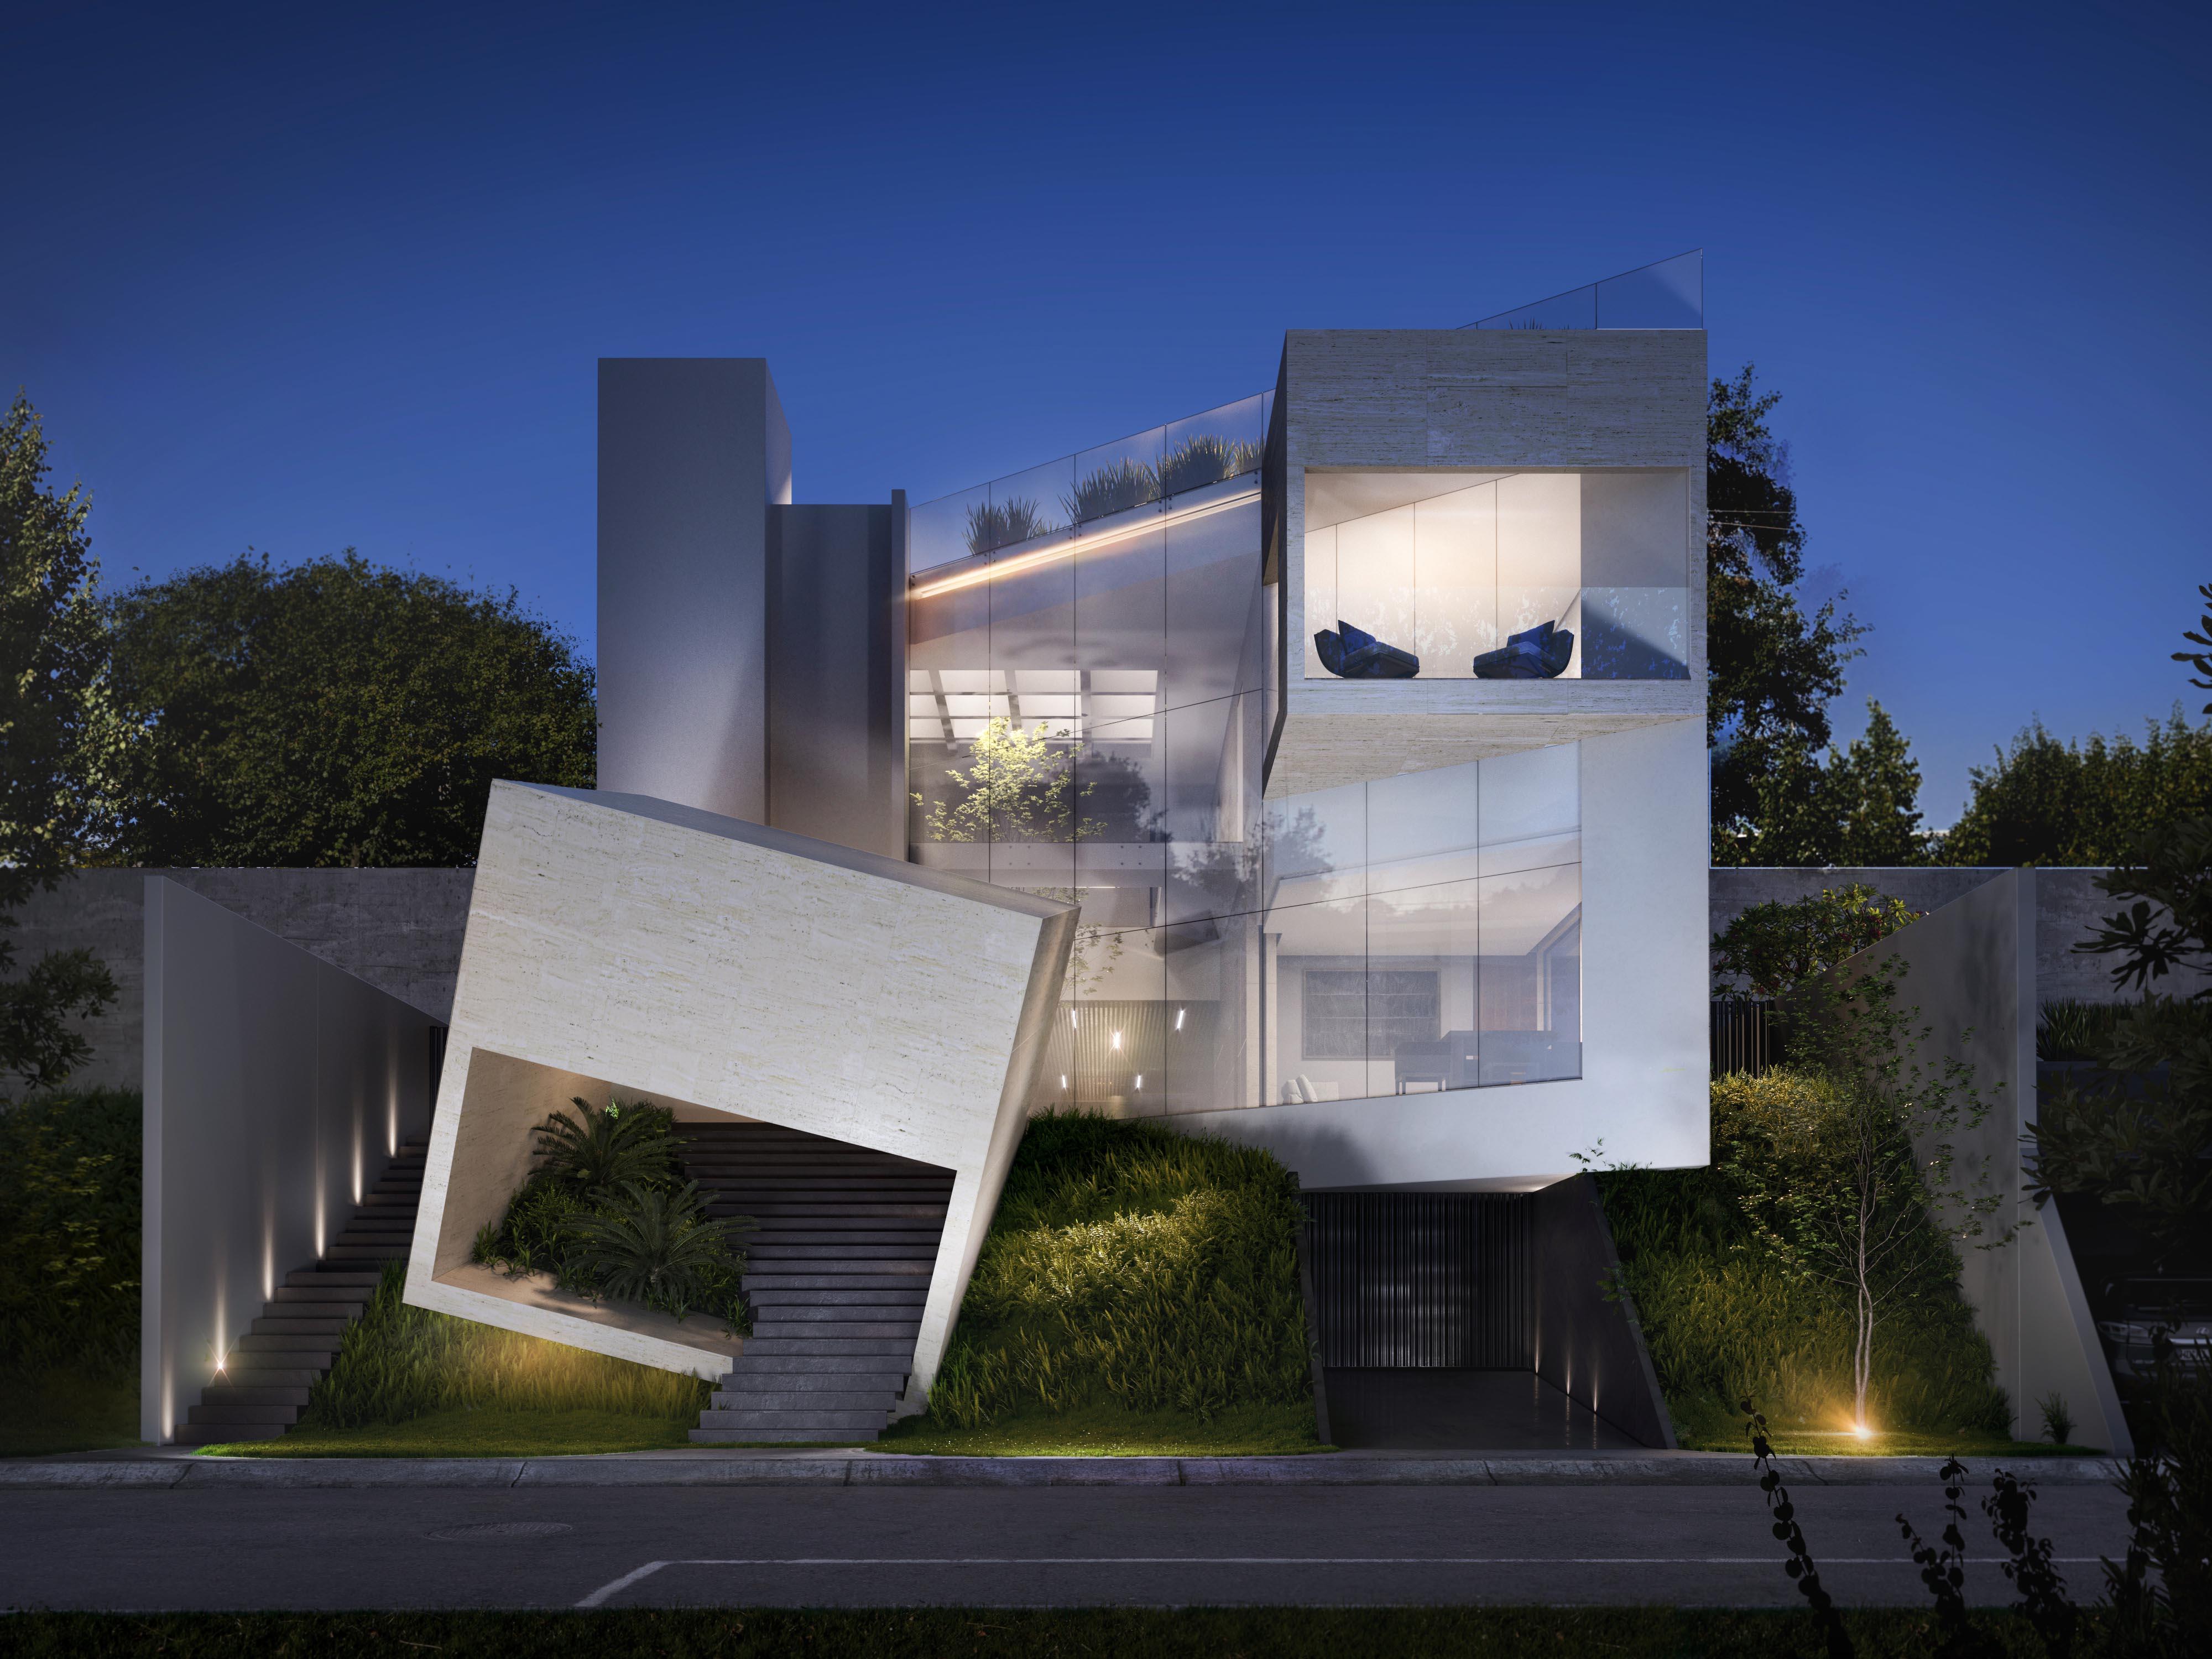 Casa CC designed by Lassala + Orozco Architecture Workshop